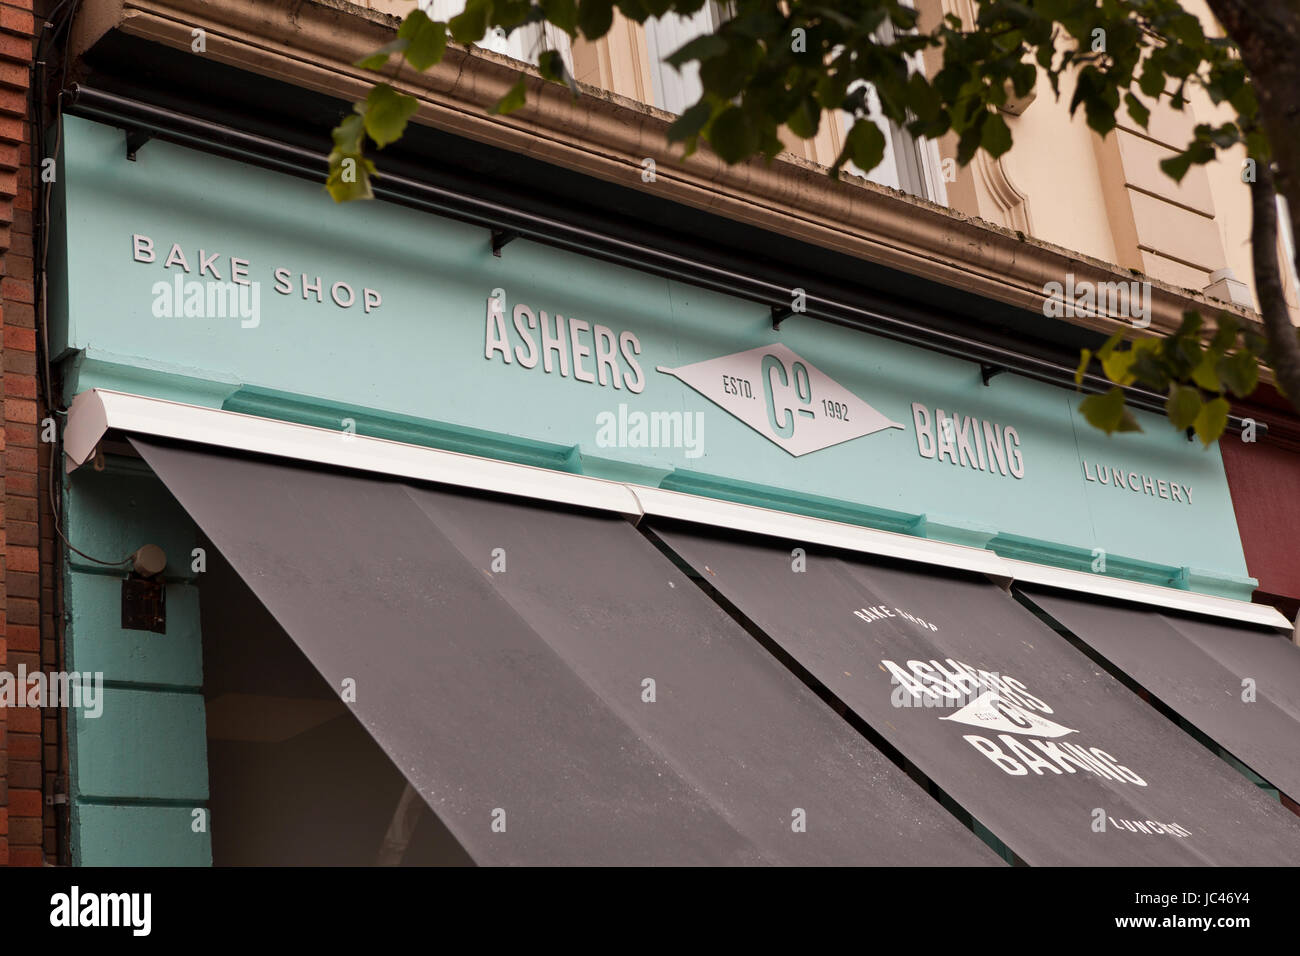 Royal Avenue, Belfast 13th June 2017. Ashers Bakery shop in Belfast - Stock Image